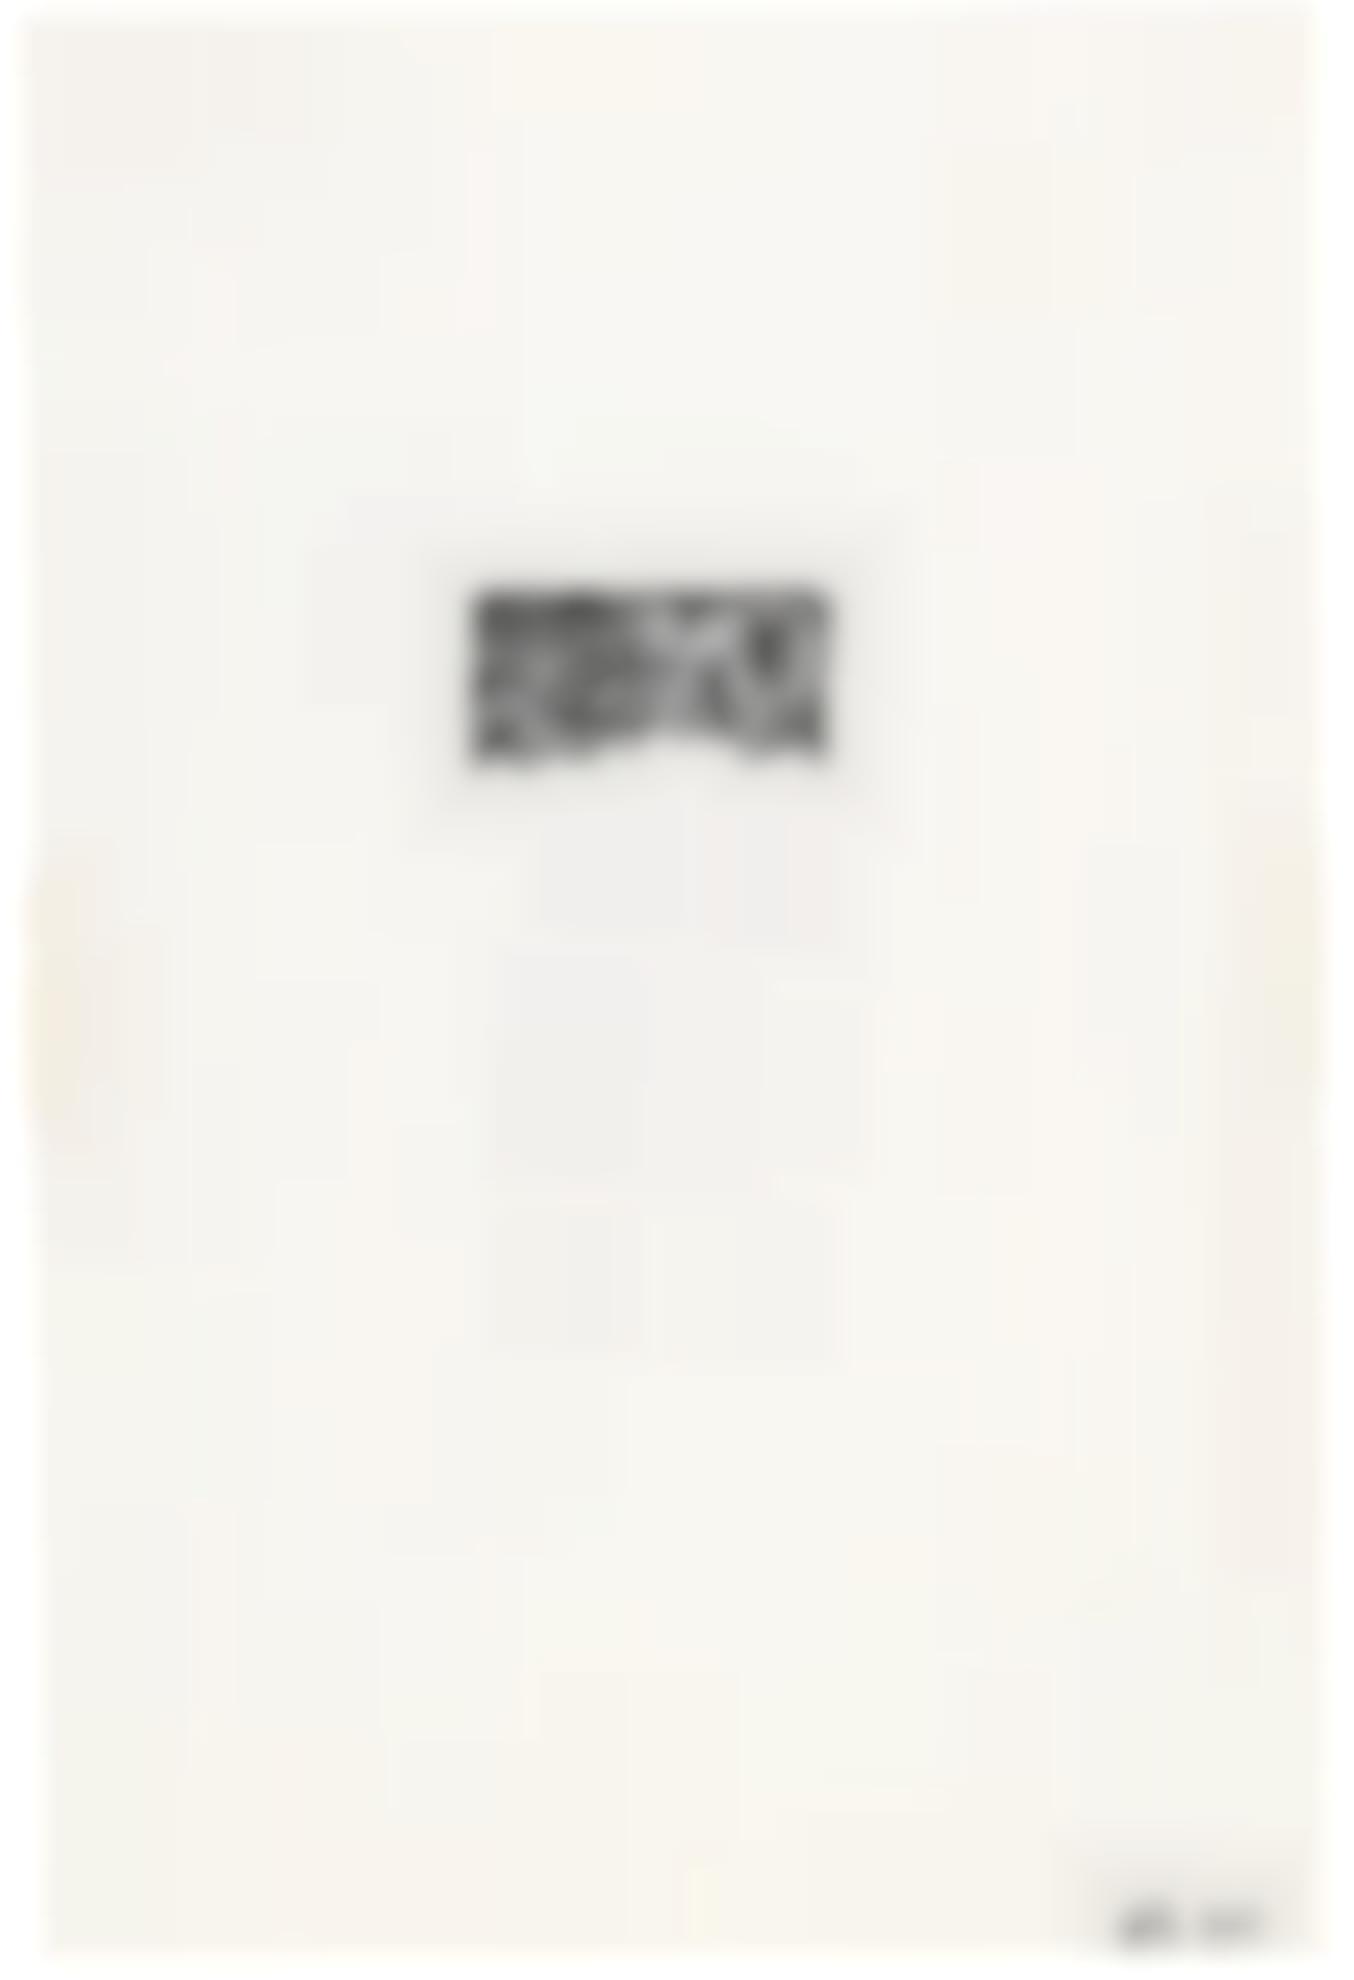 Brice Marden-Suicide Note-1972